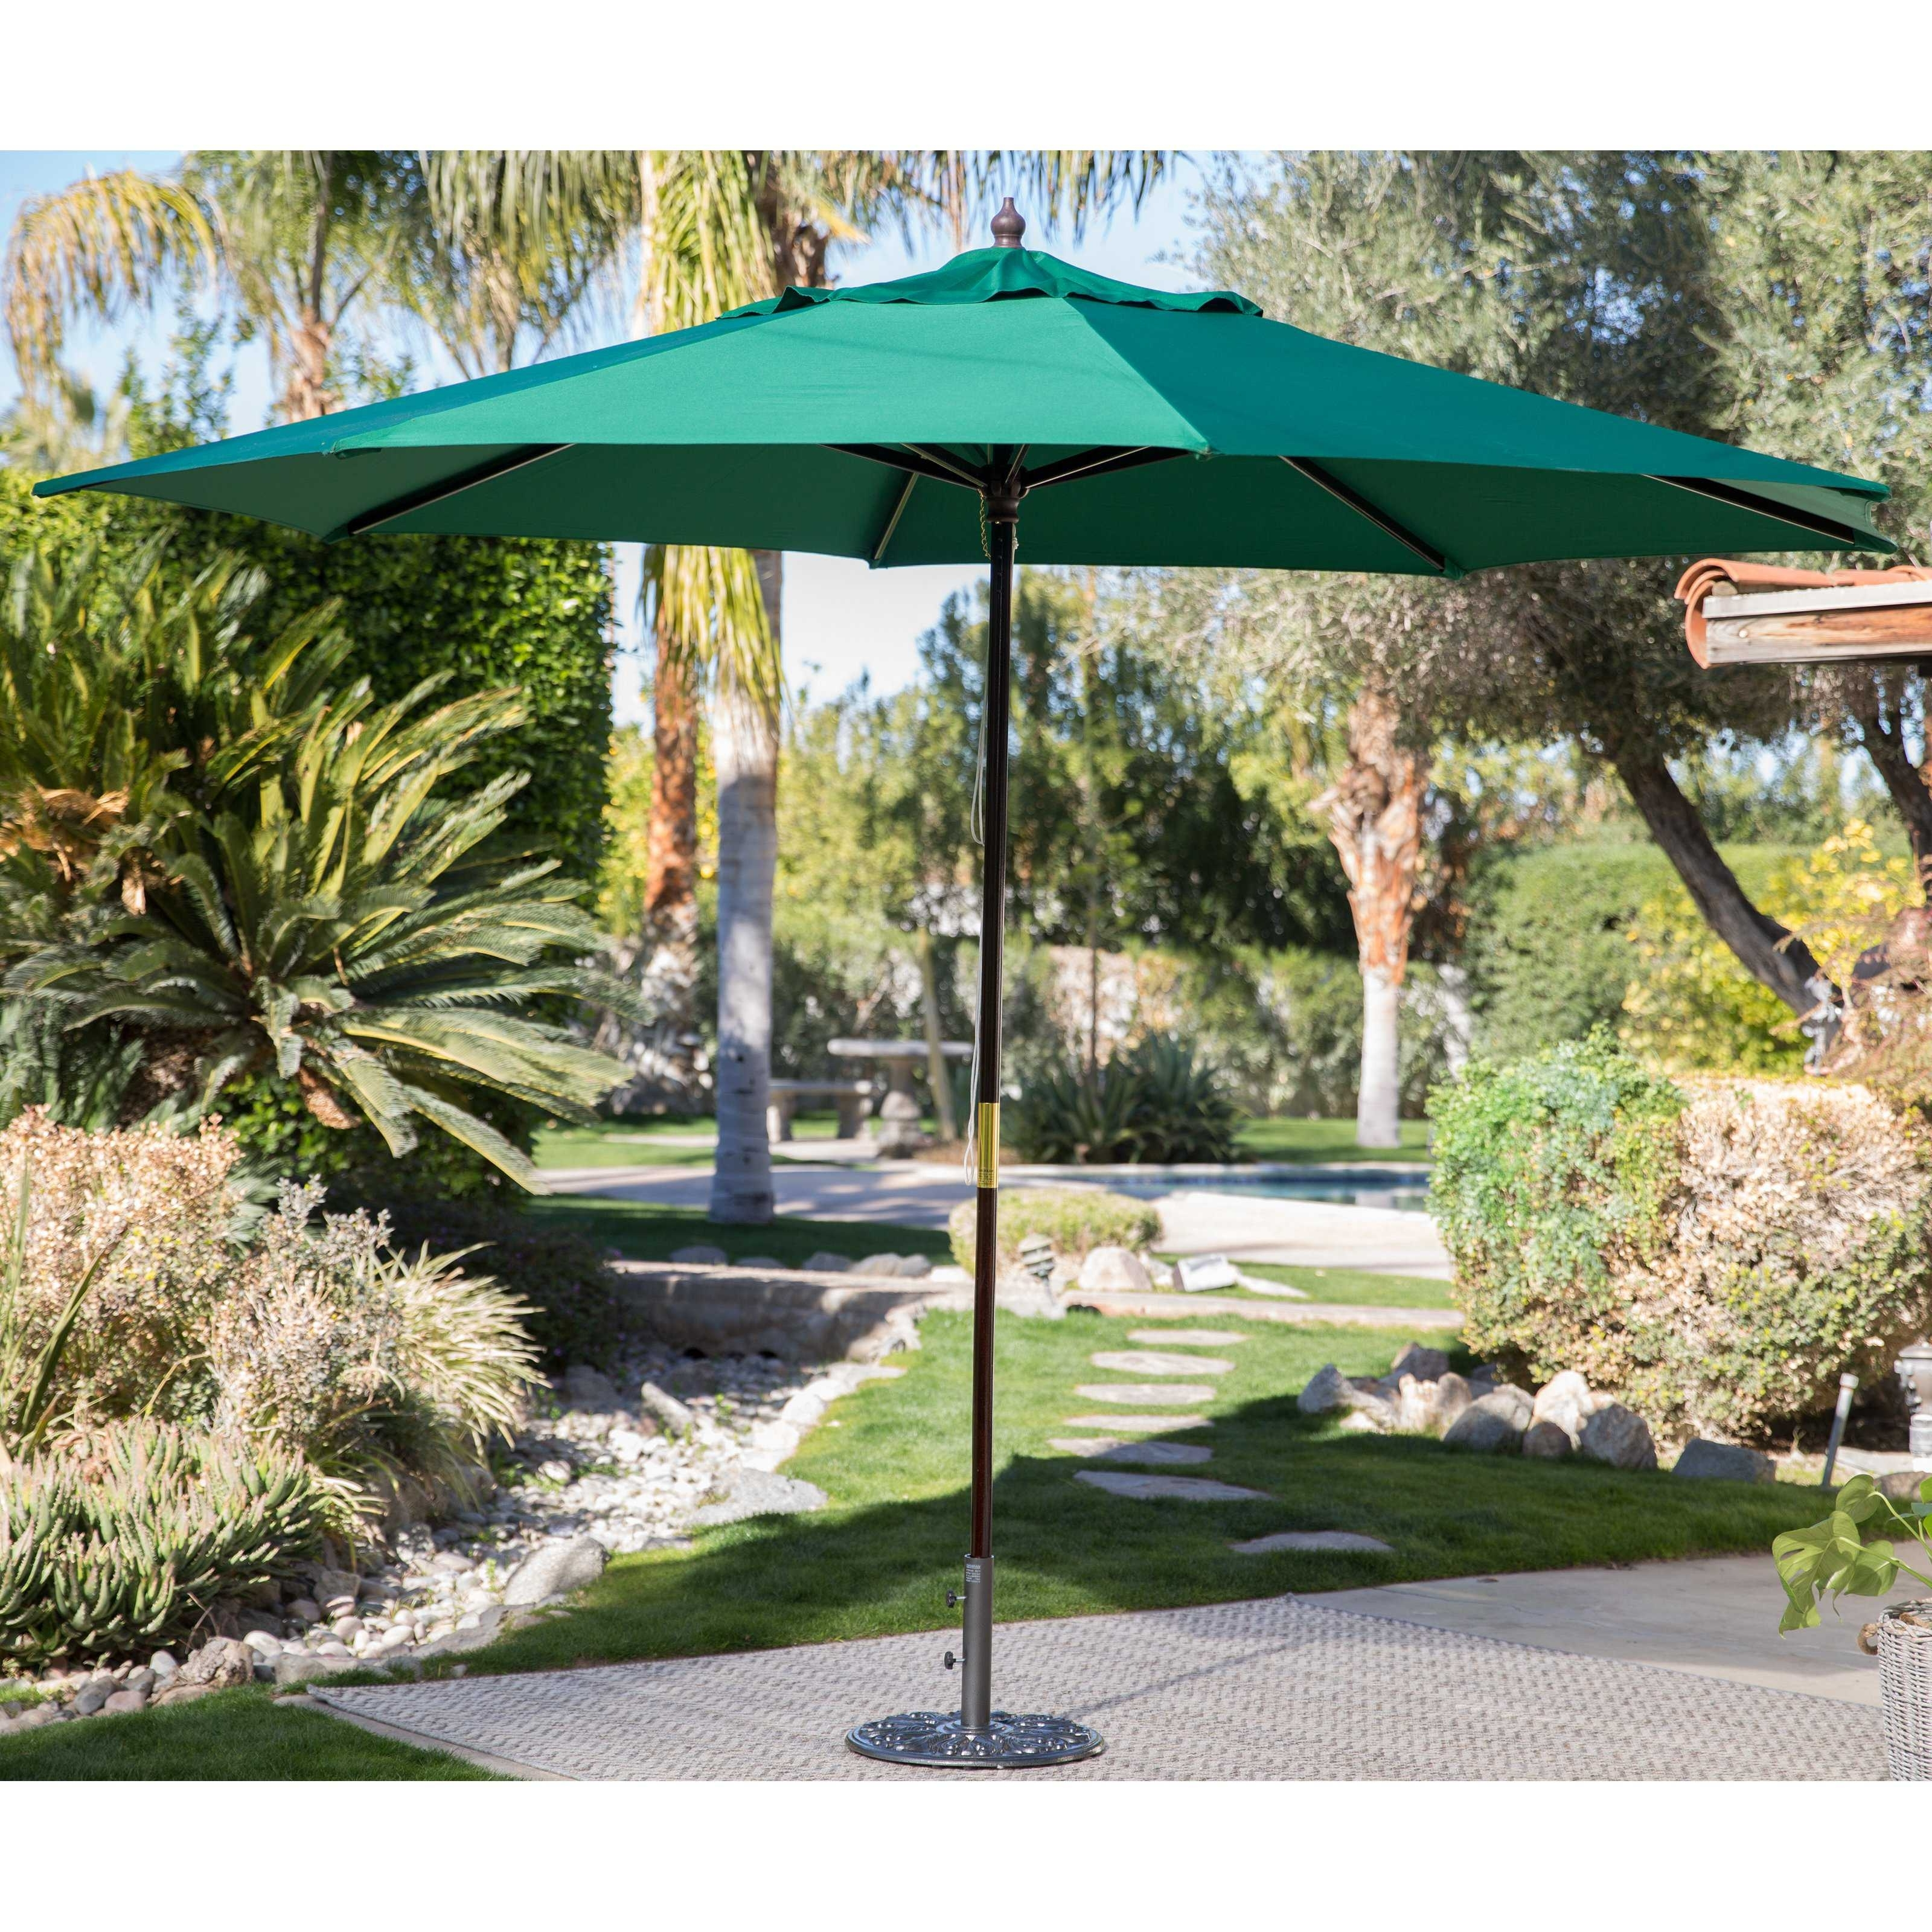 Cheap Patio Umbrellas Inside Current Cheap Patio Umbrellas – Interperform (View 2 of 20)